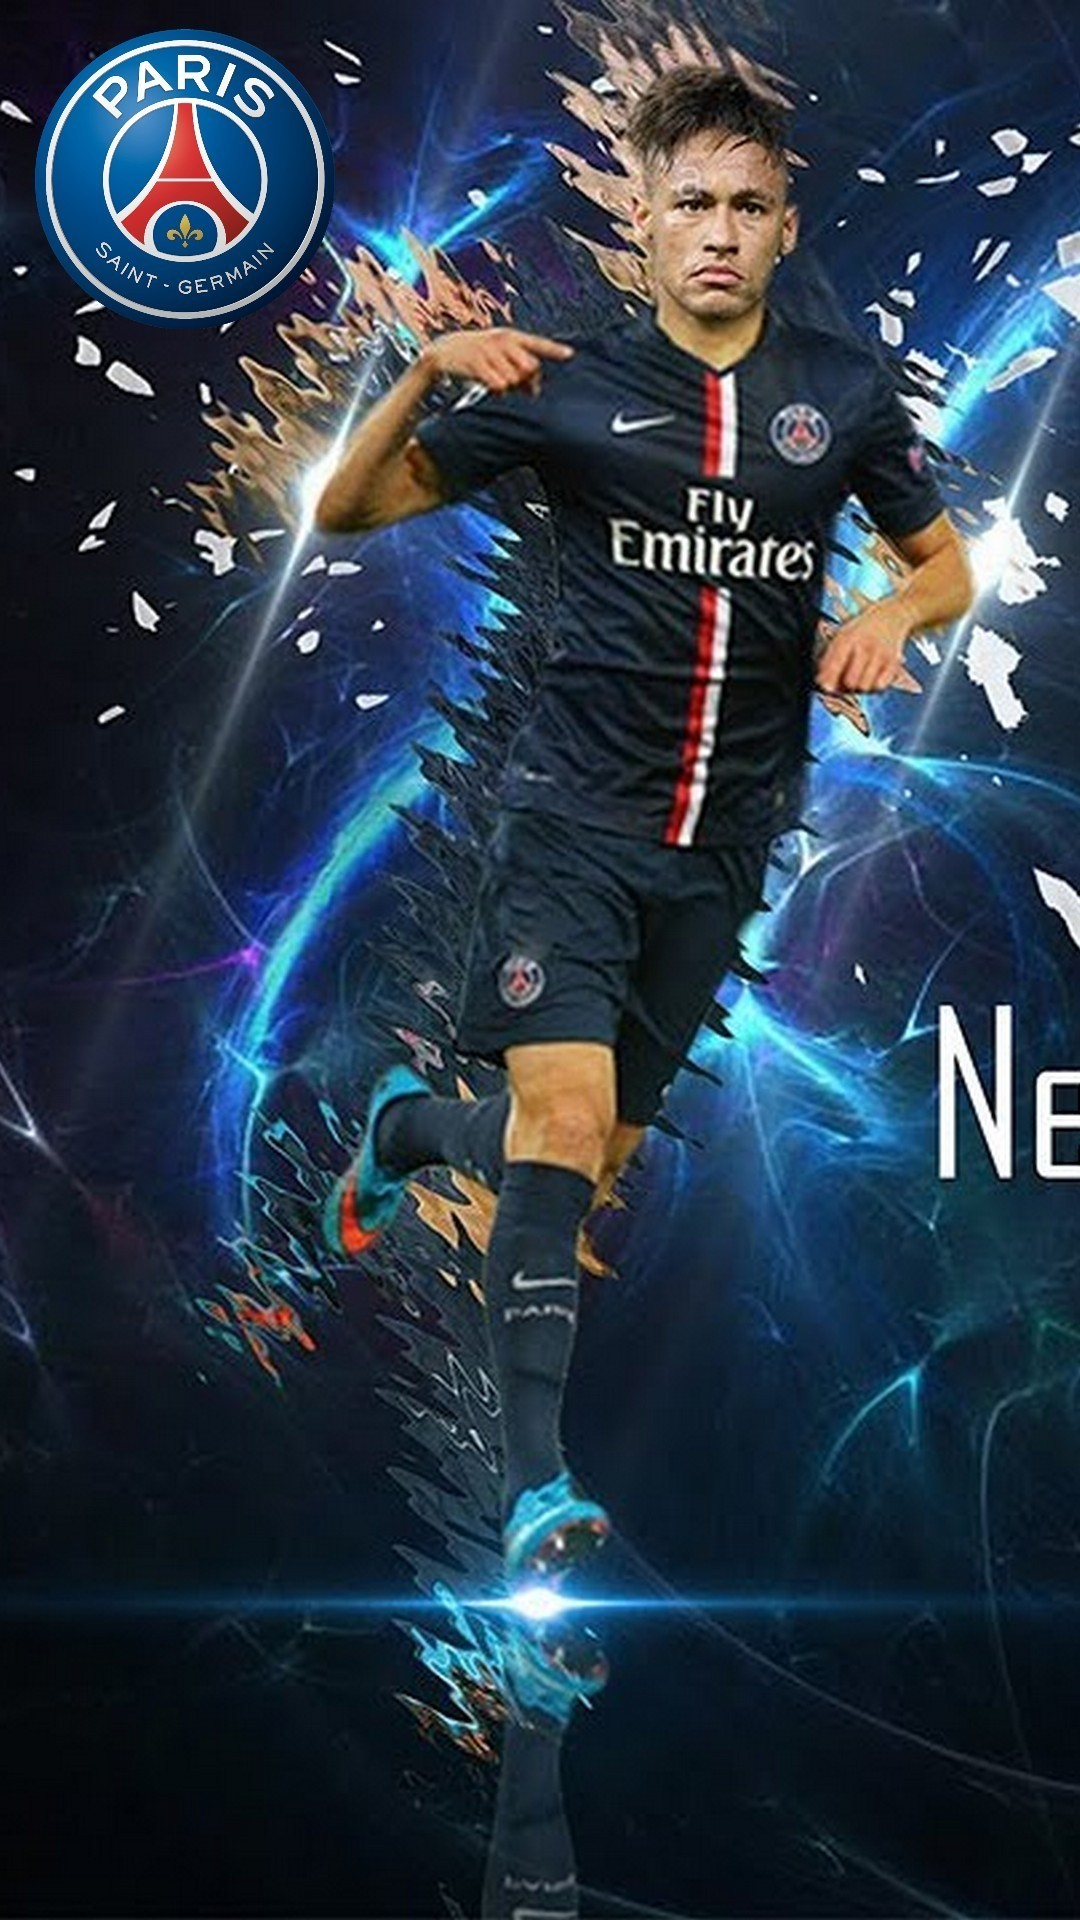 Neymar Wallpaper - EnWallpaper